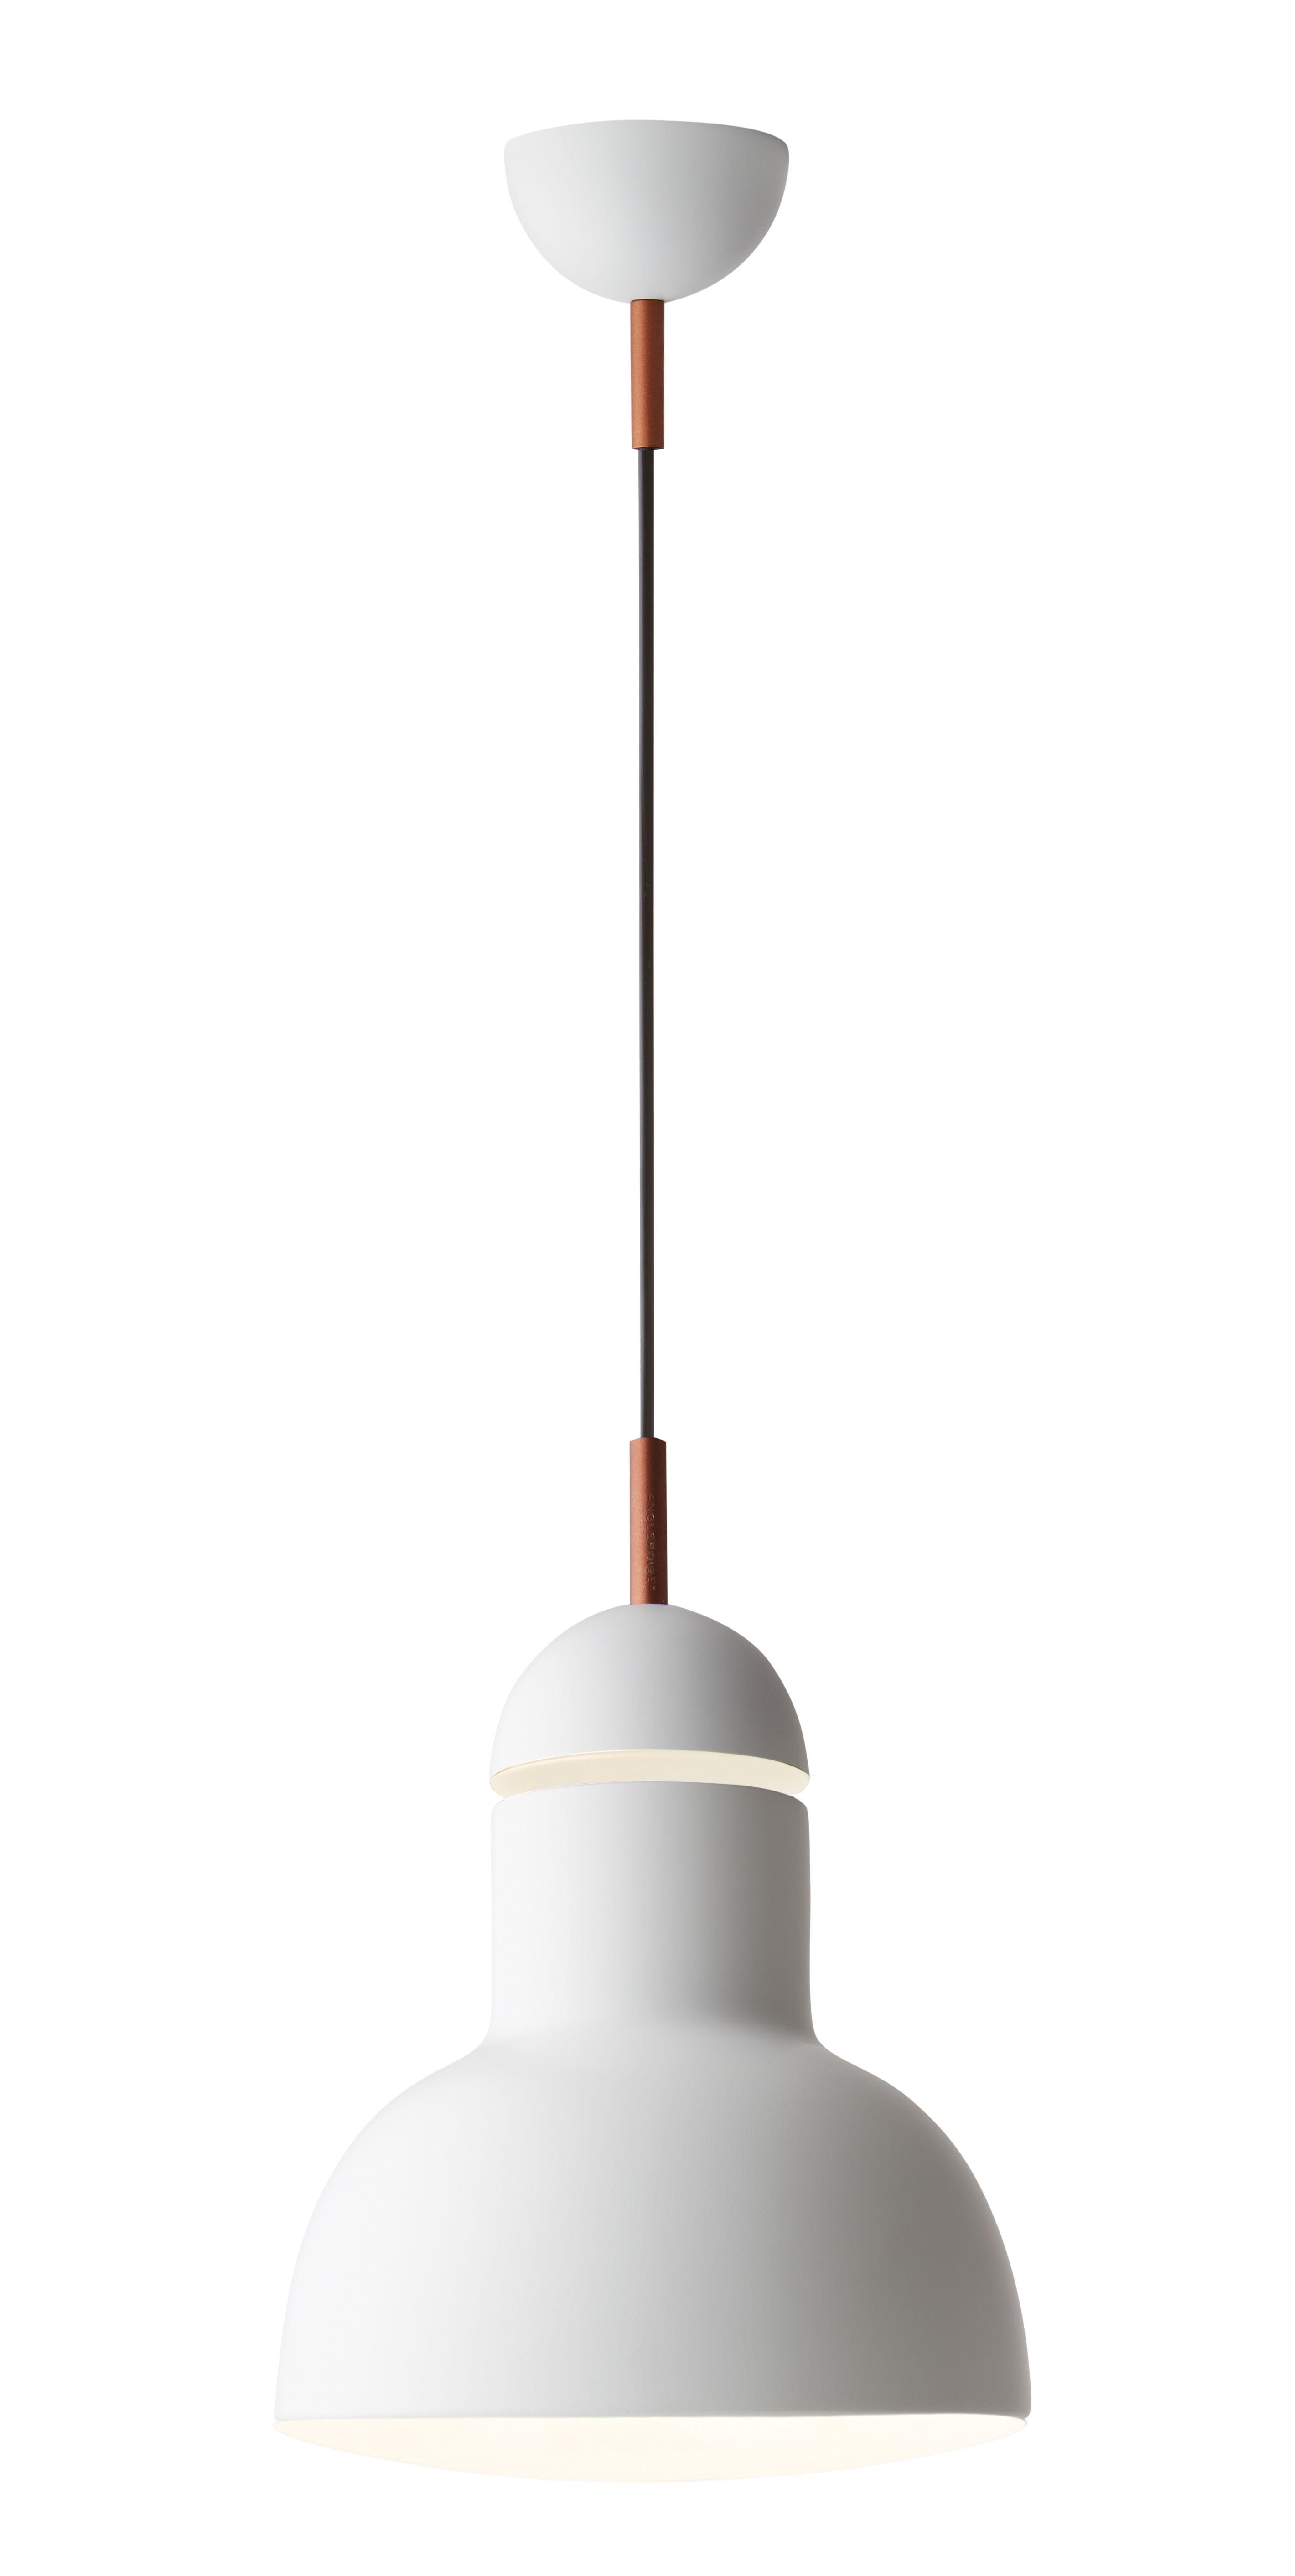 Suspension type 75 maxi 23 cm blanc anglepoise - Luminaire industriel la giant collection par anglepoise ...